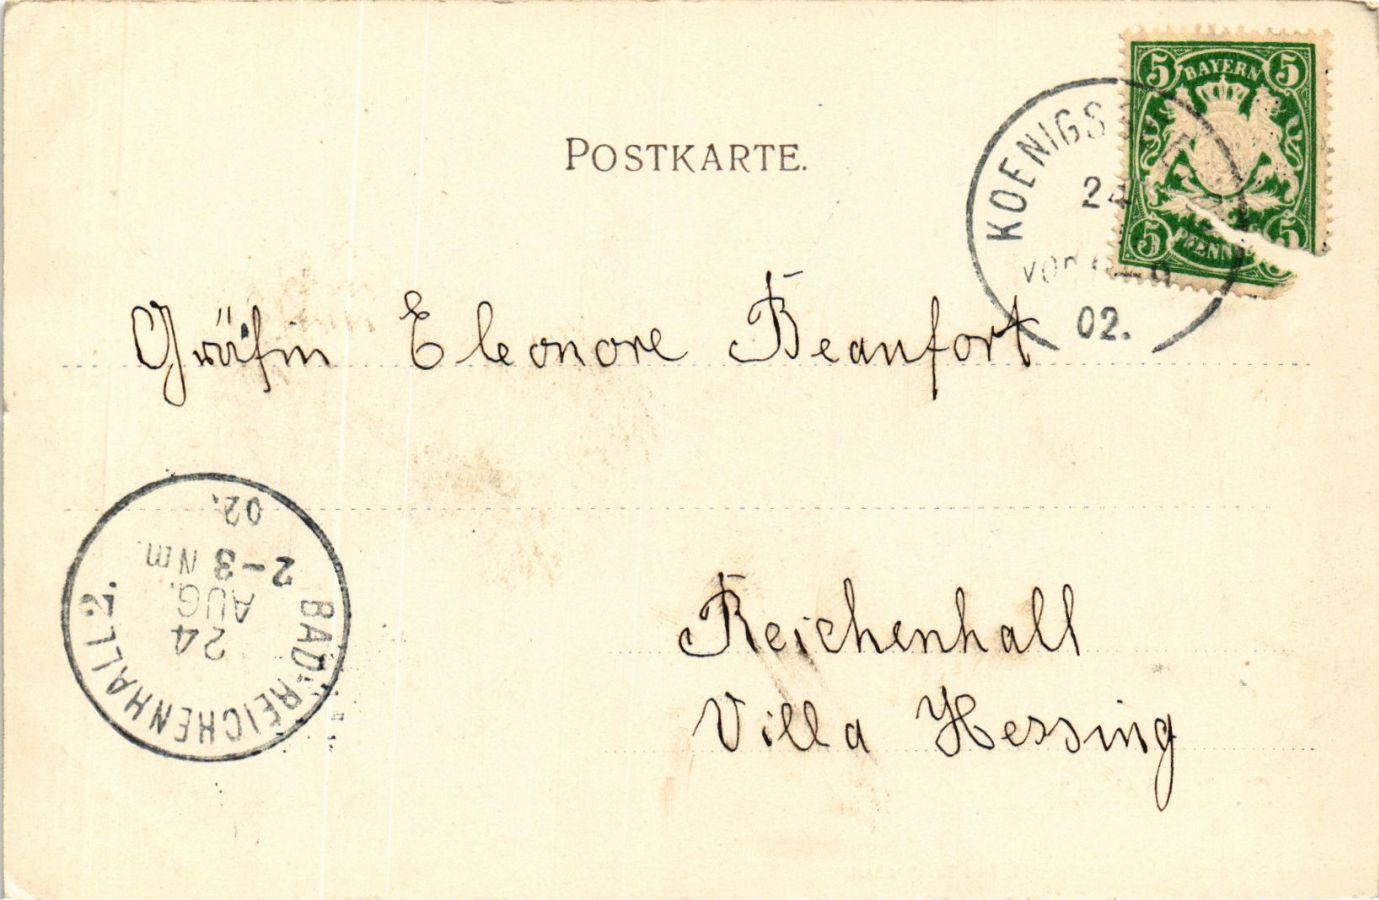 CPA-AK-Konigssee-St-Bartholoma-GERMANY-878954 miniature 2